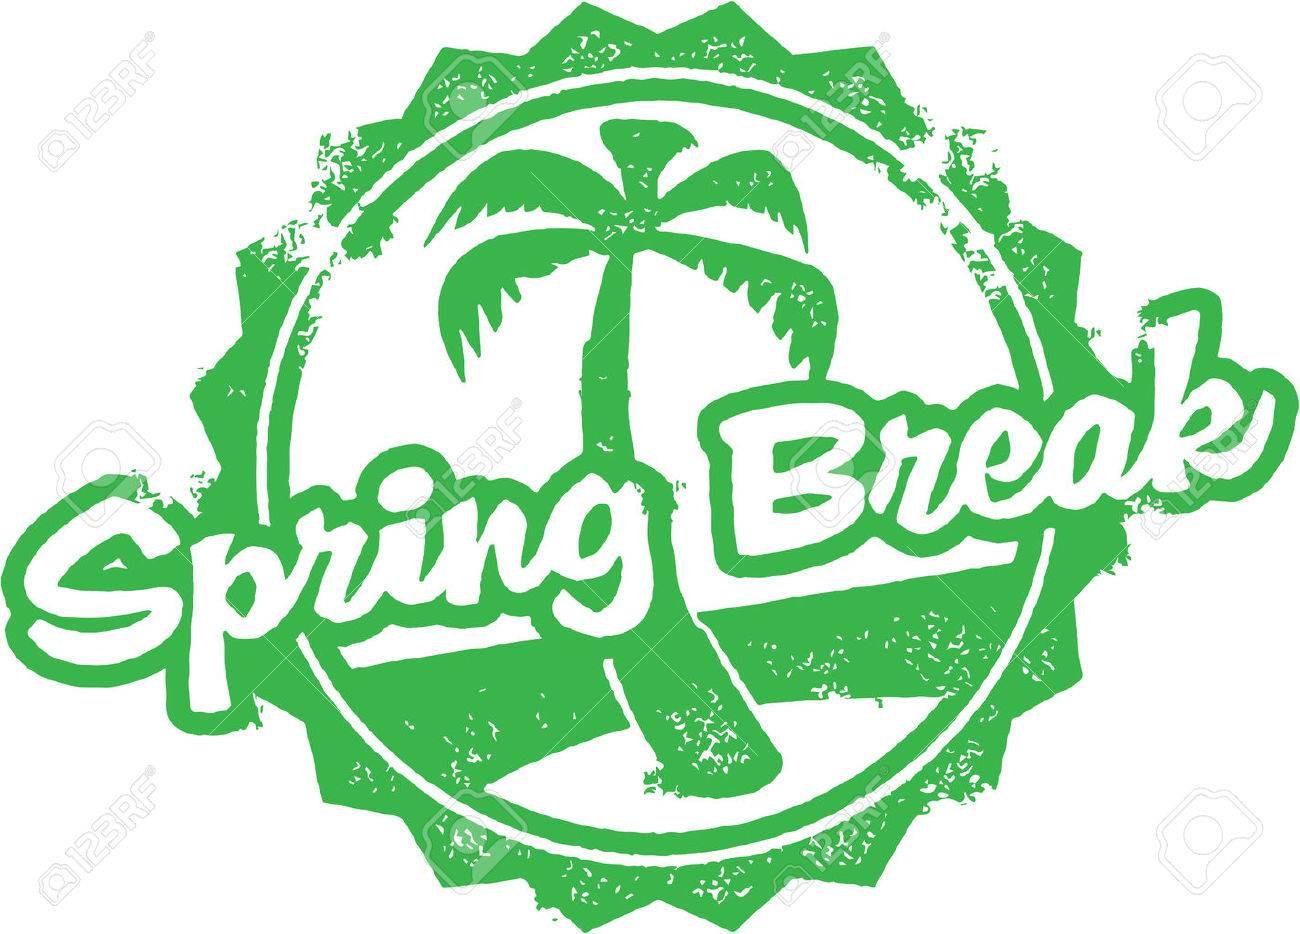 Spring Break Rubber Stamp - 25666694